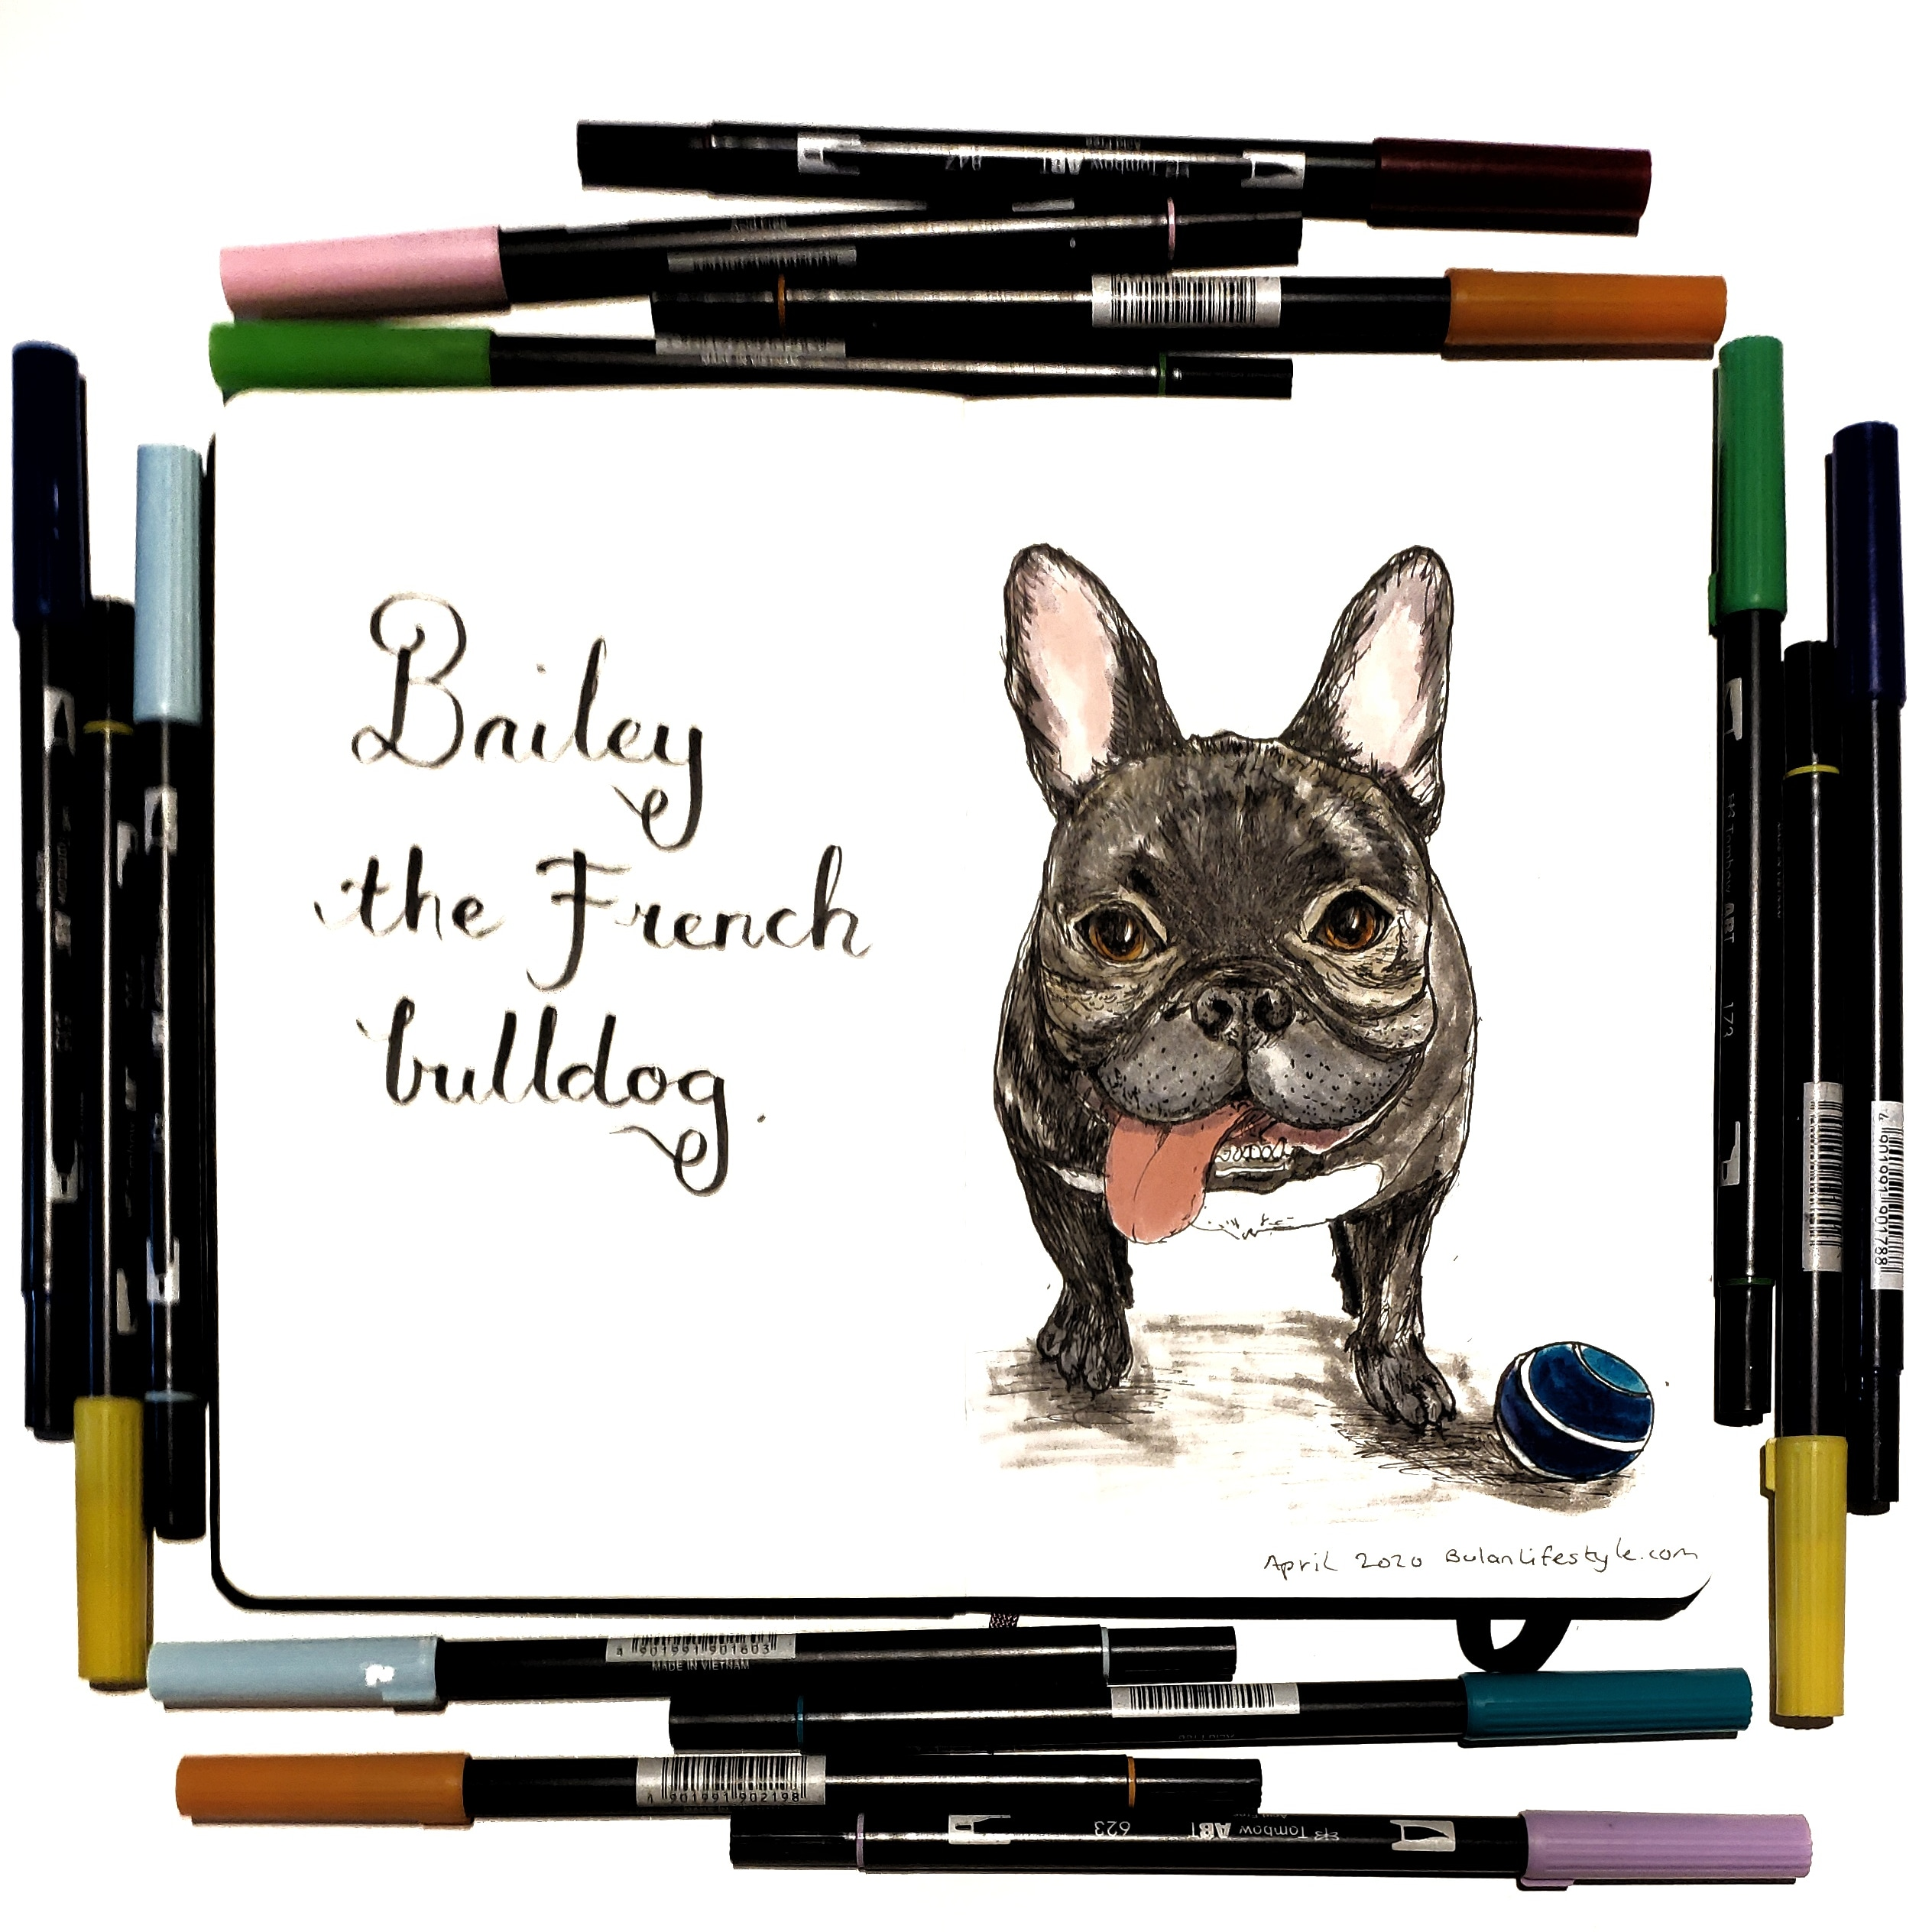 Bailey the French bulldog